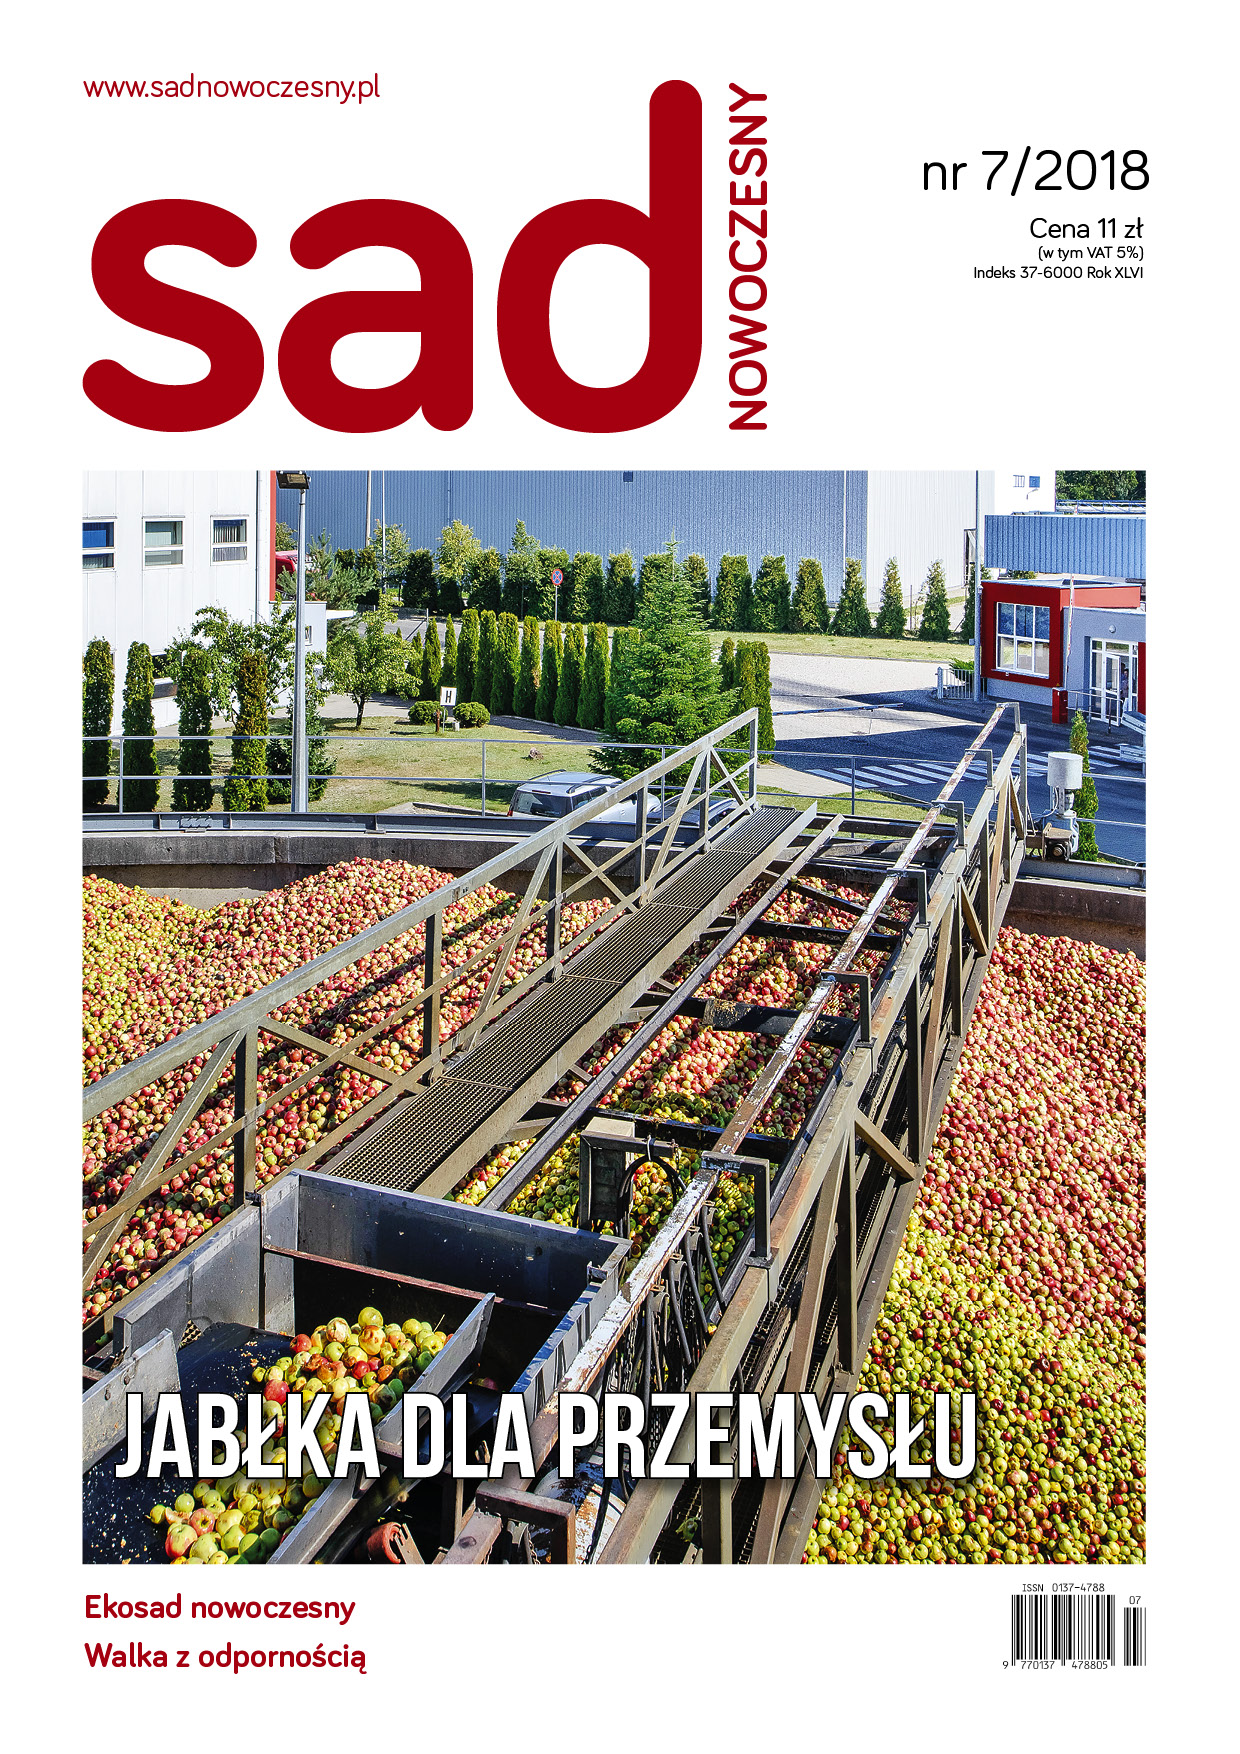 sn07_2018-okladka